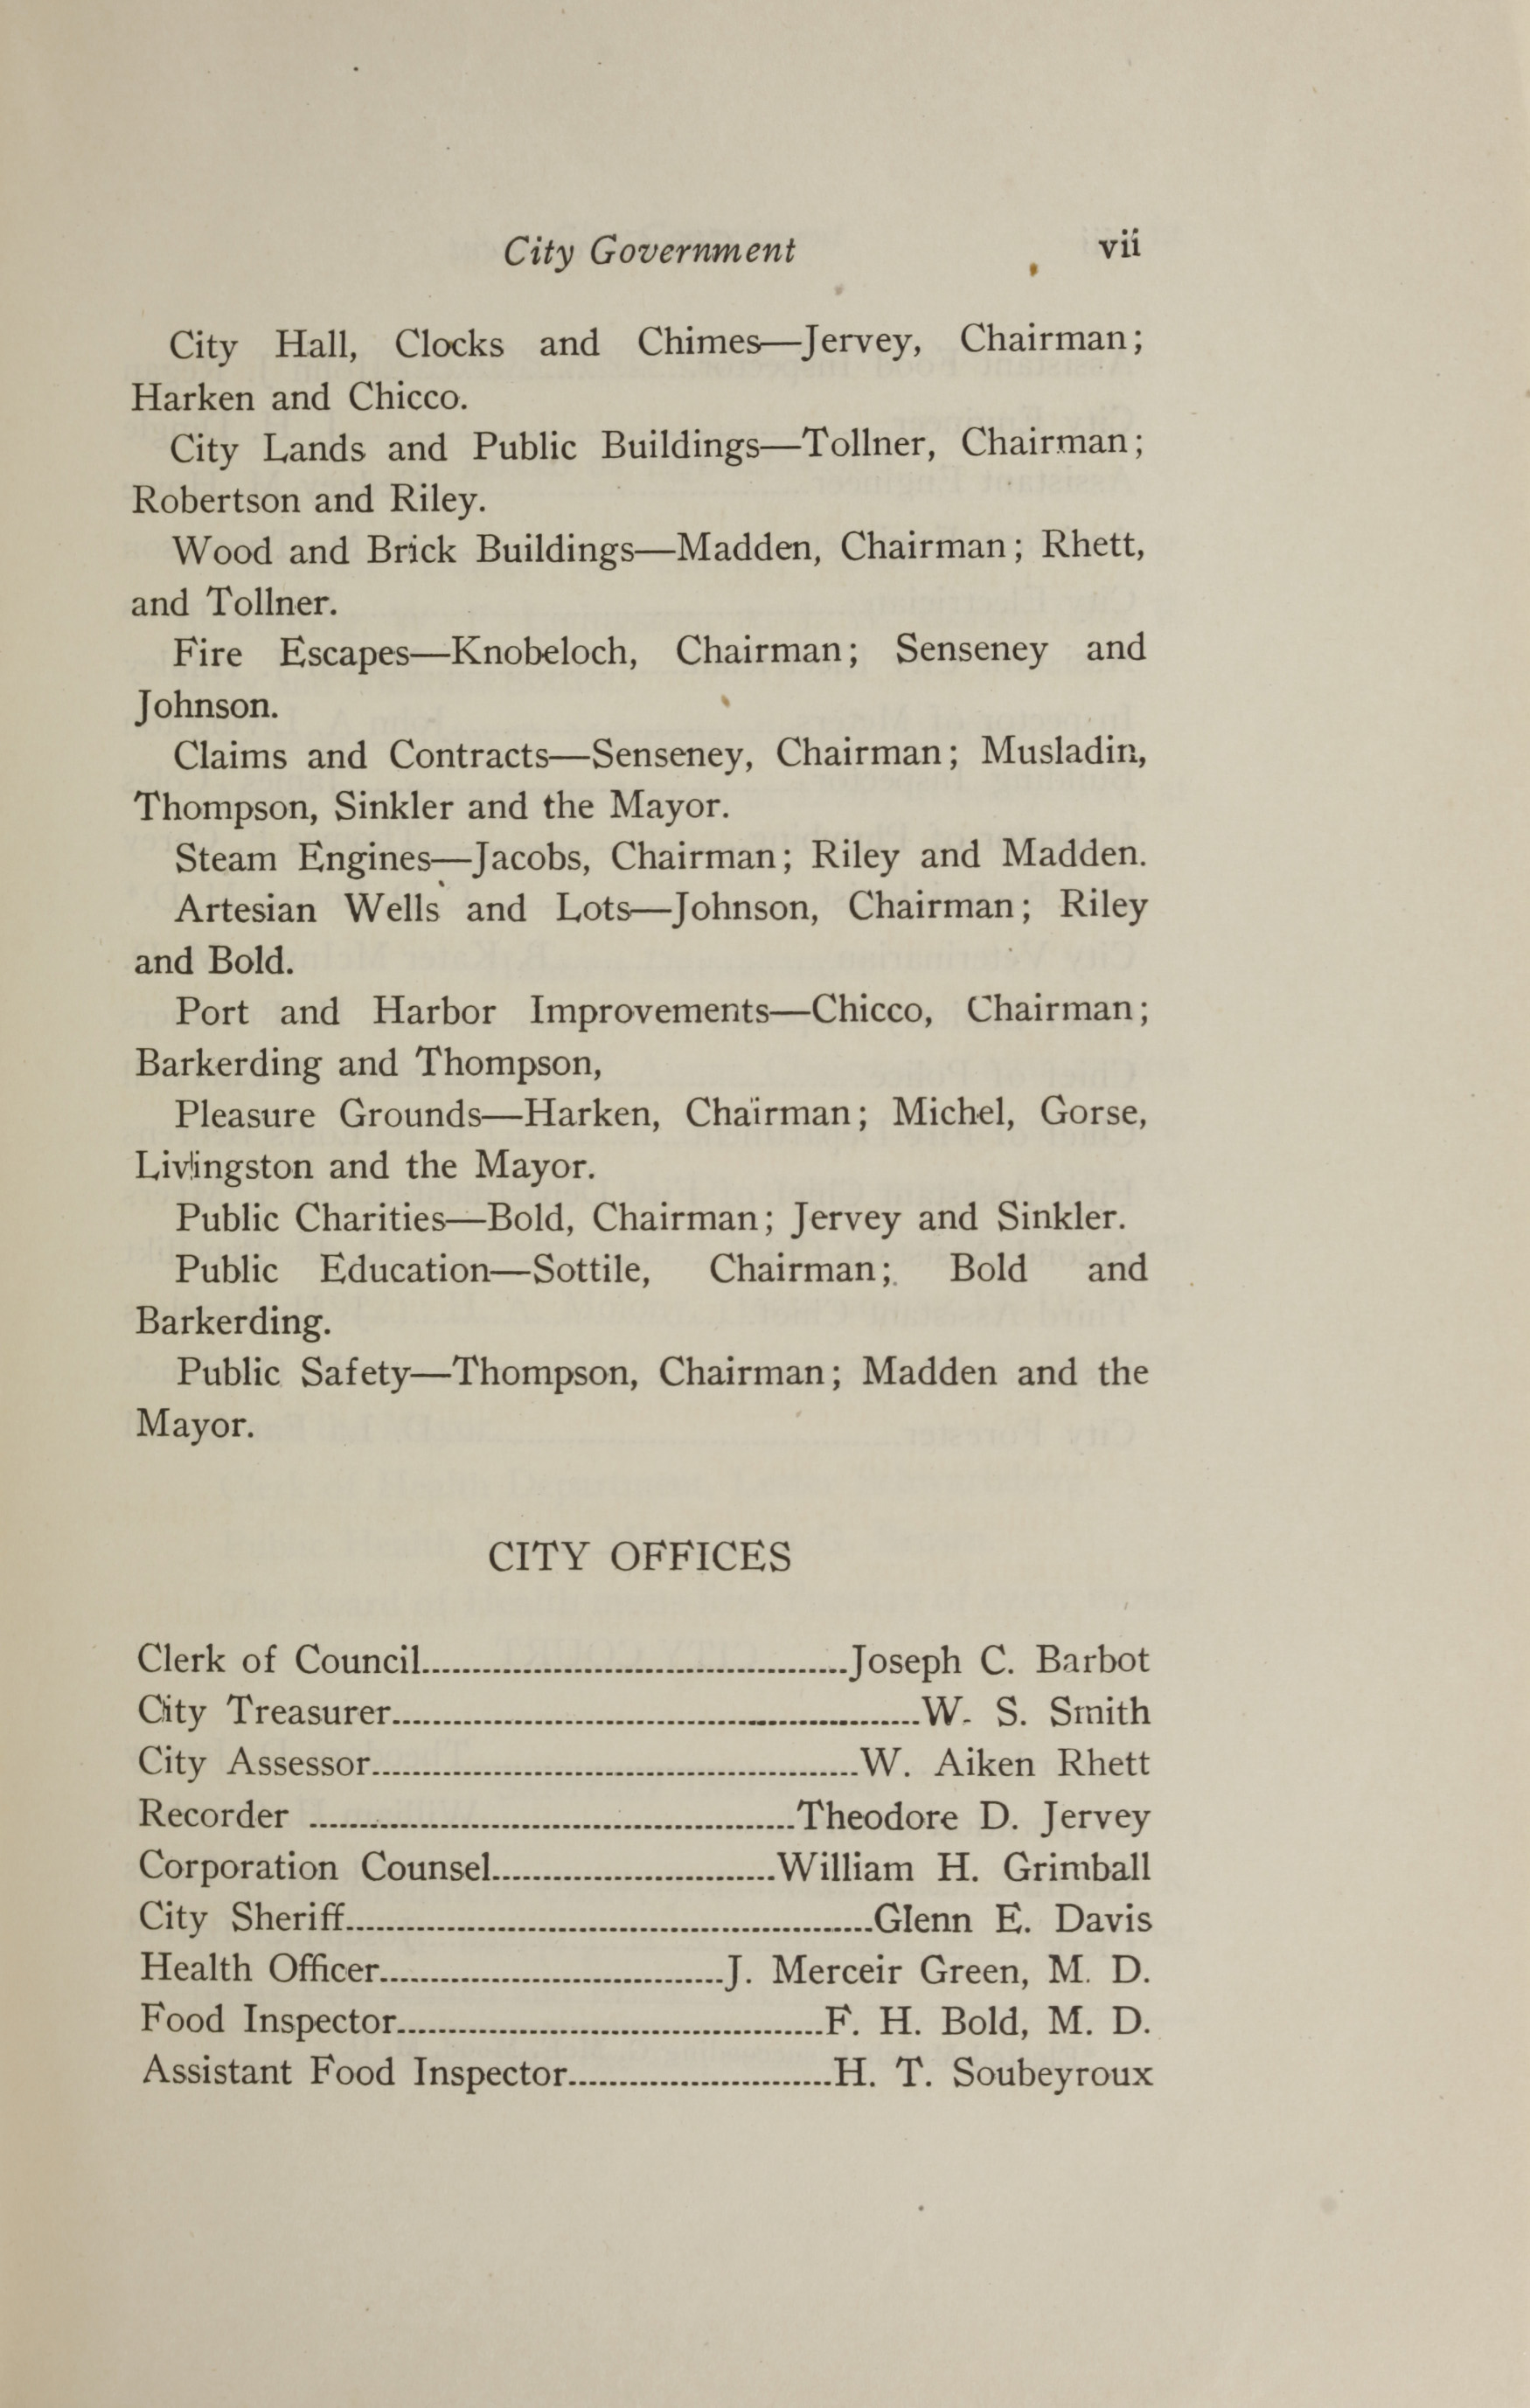 Charleston Yearbook, 1921, page vii